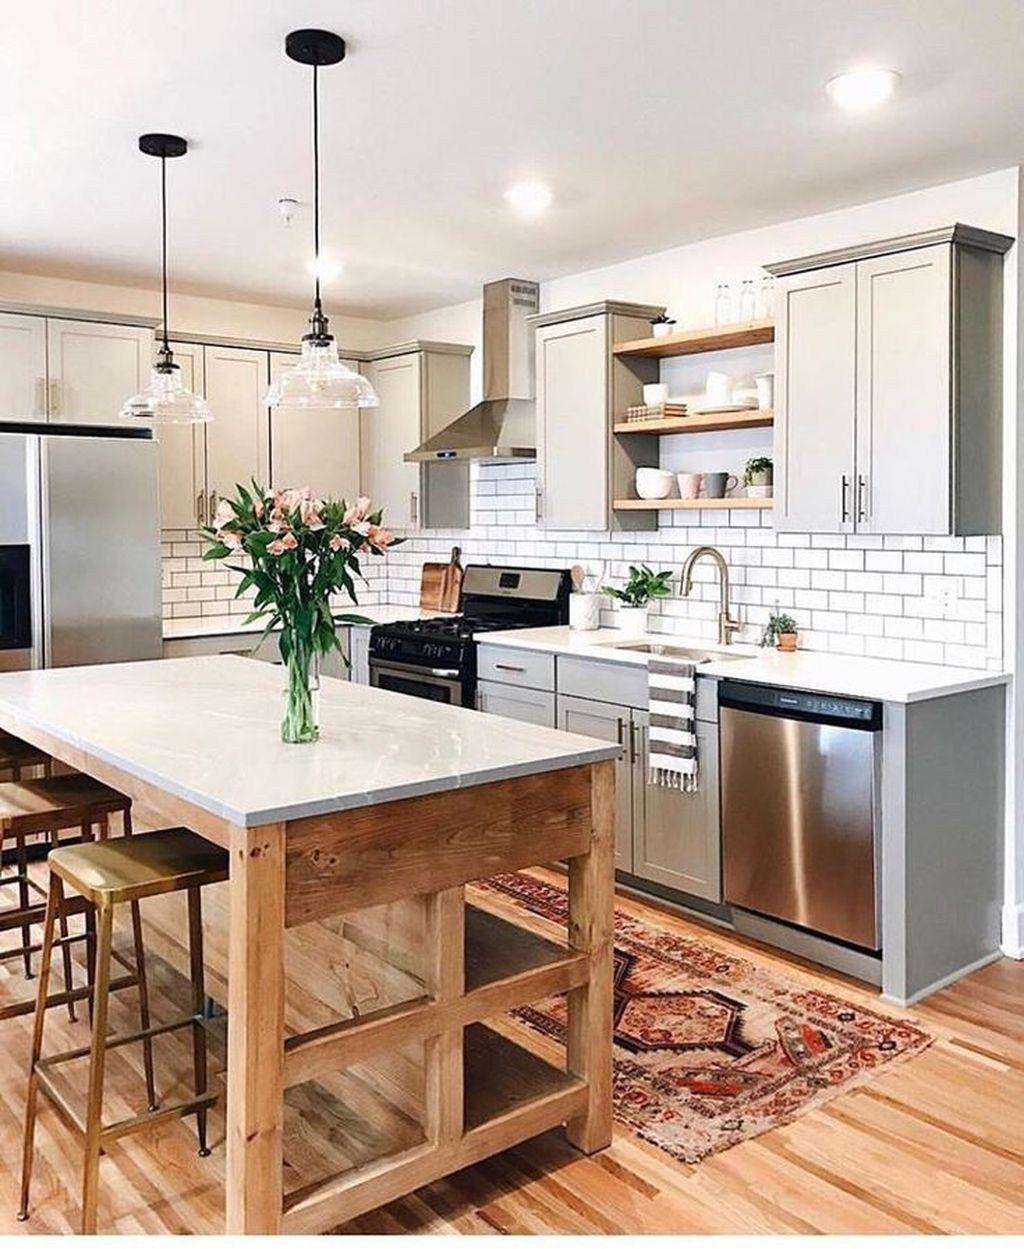 Cool modern farmhouse kitchen backsplash ideas hgtv the sht